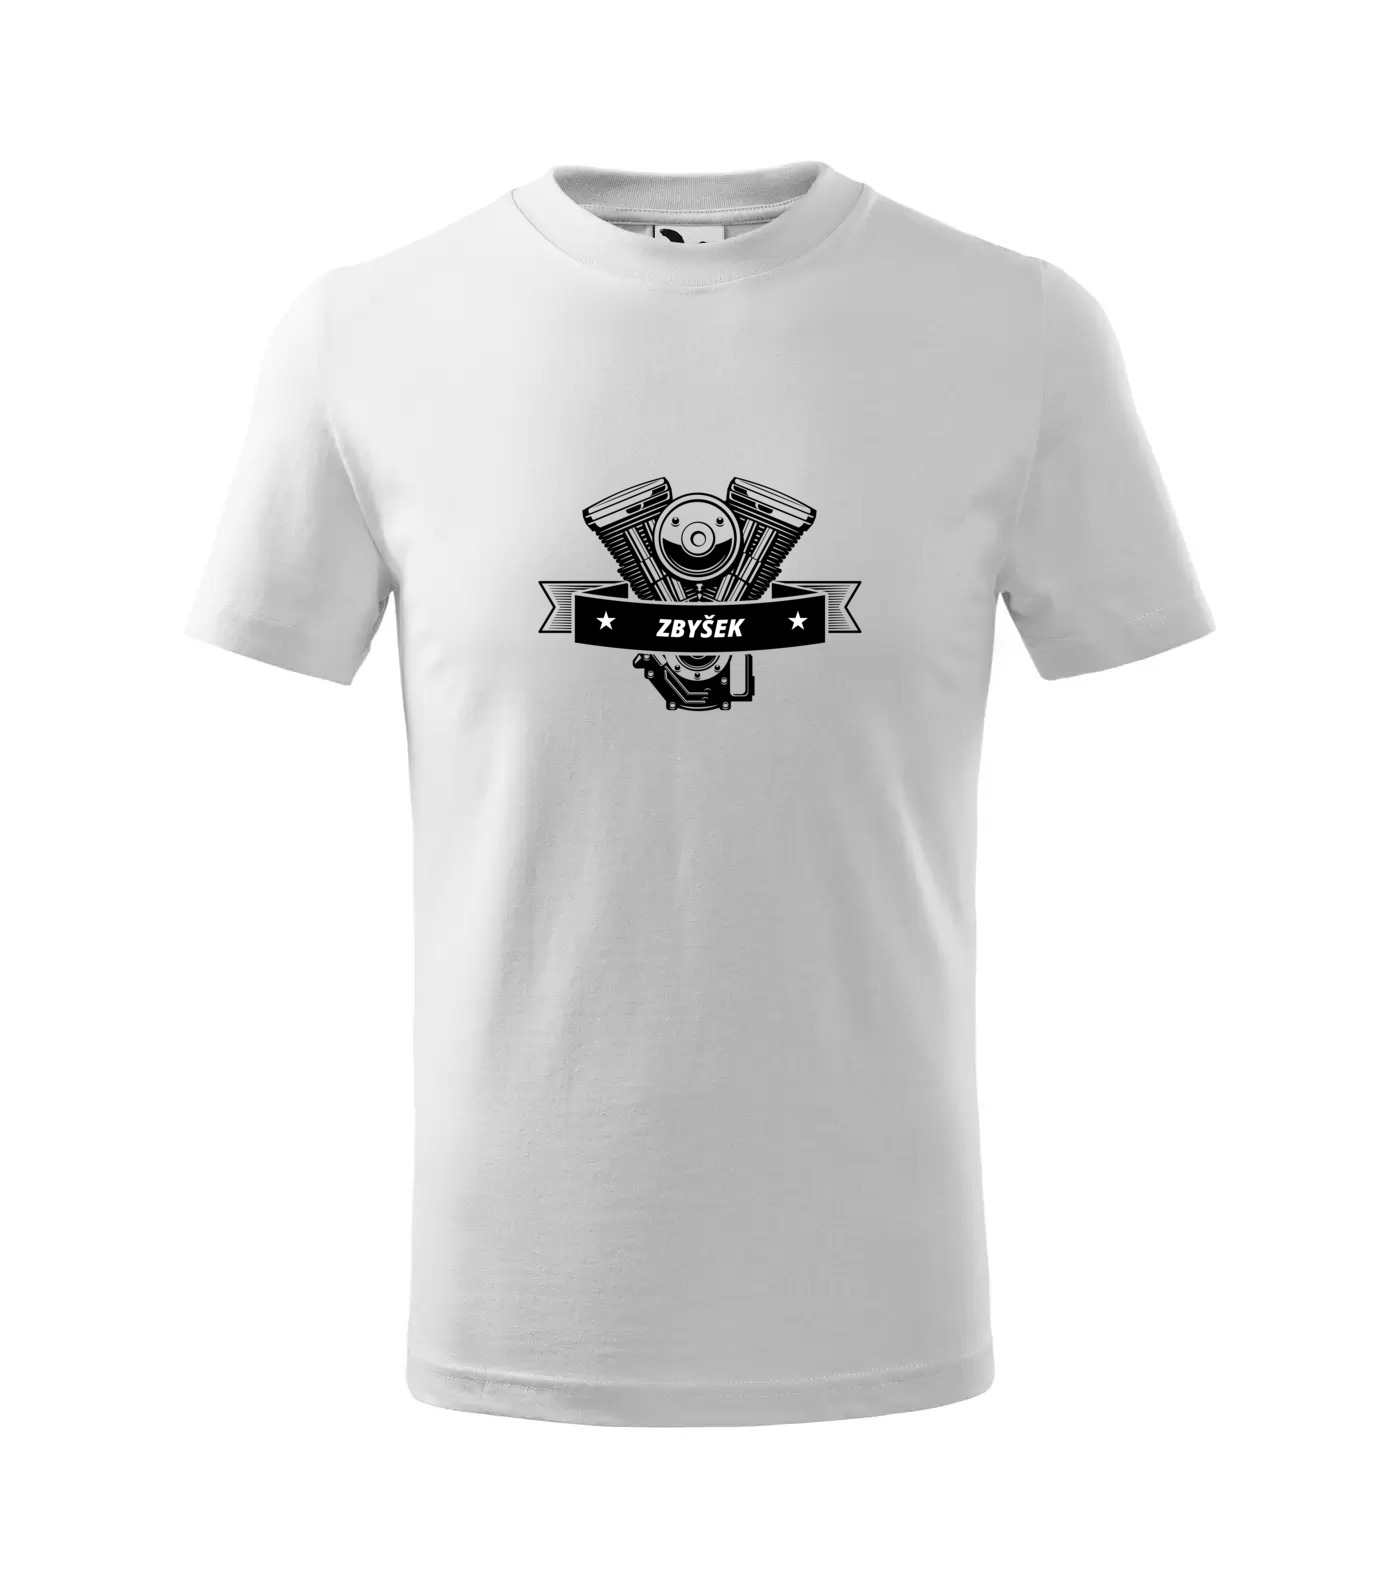 Tričko Motorkář Zbyšek